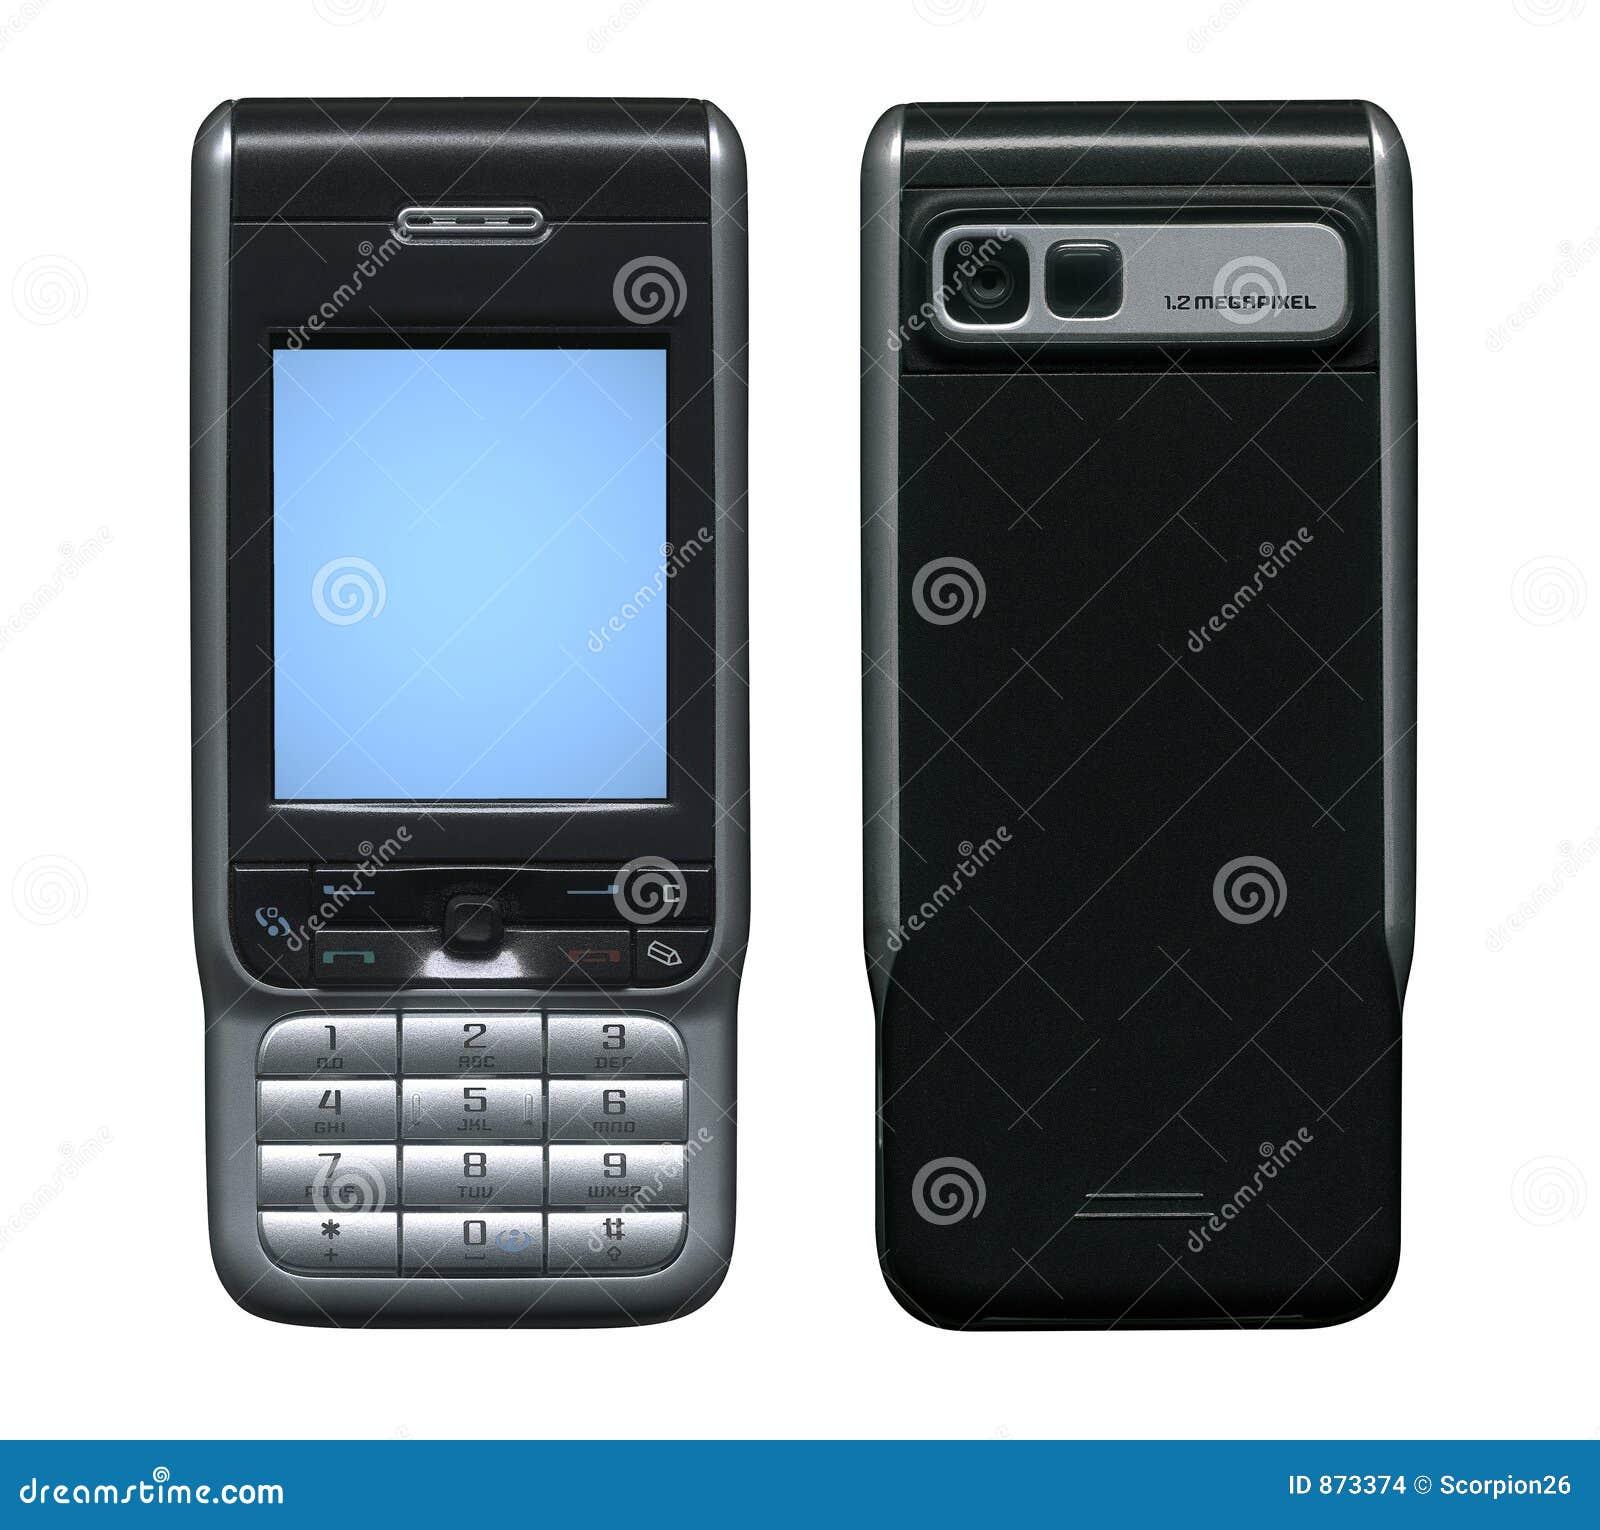 Sharp Mobile Phone GSM Windows 8 X64 Treiber